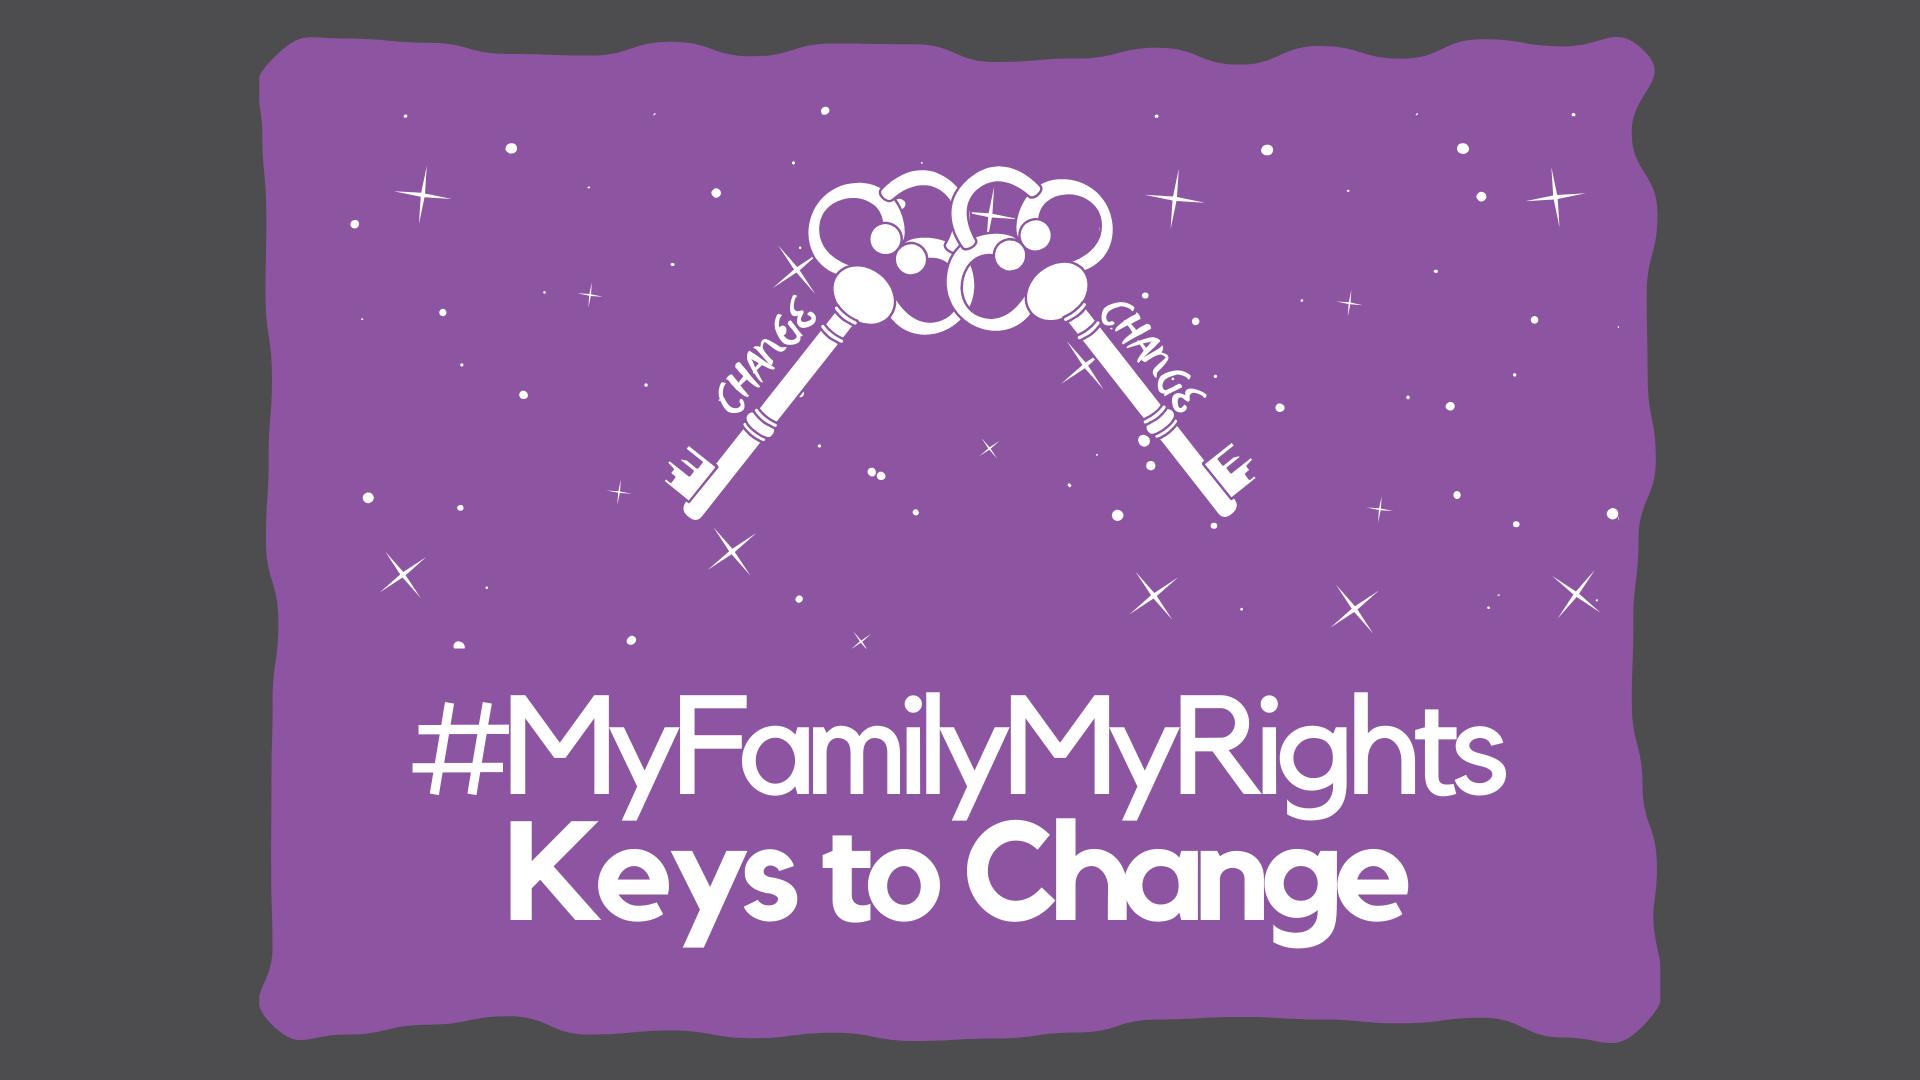 Keys on a purple background